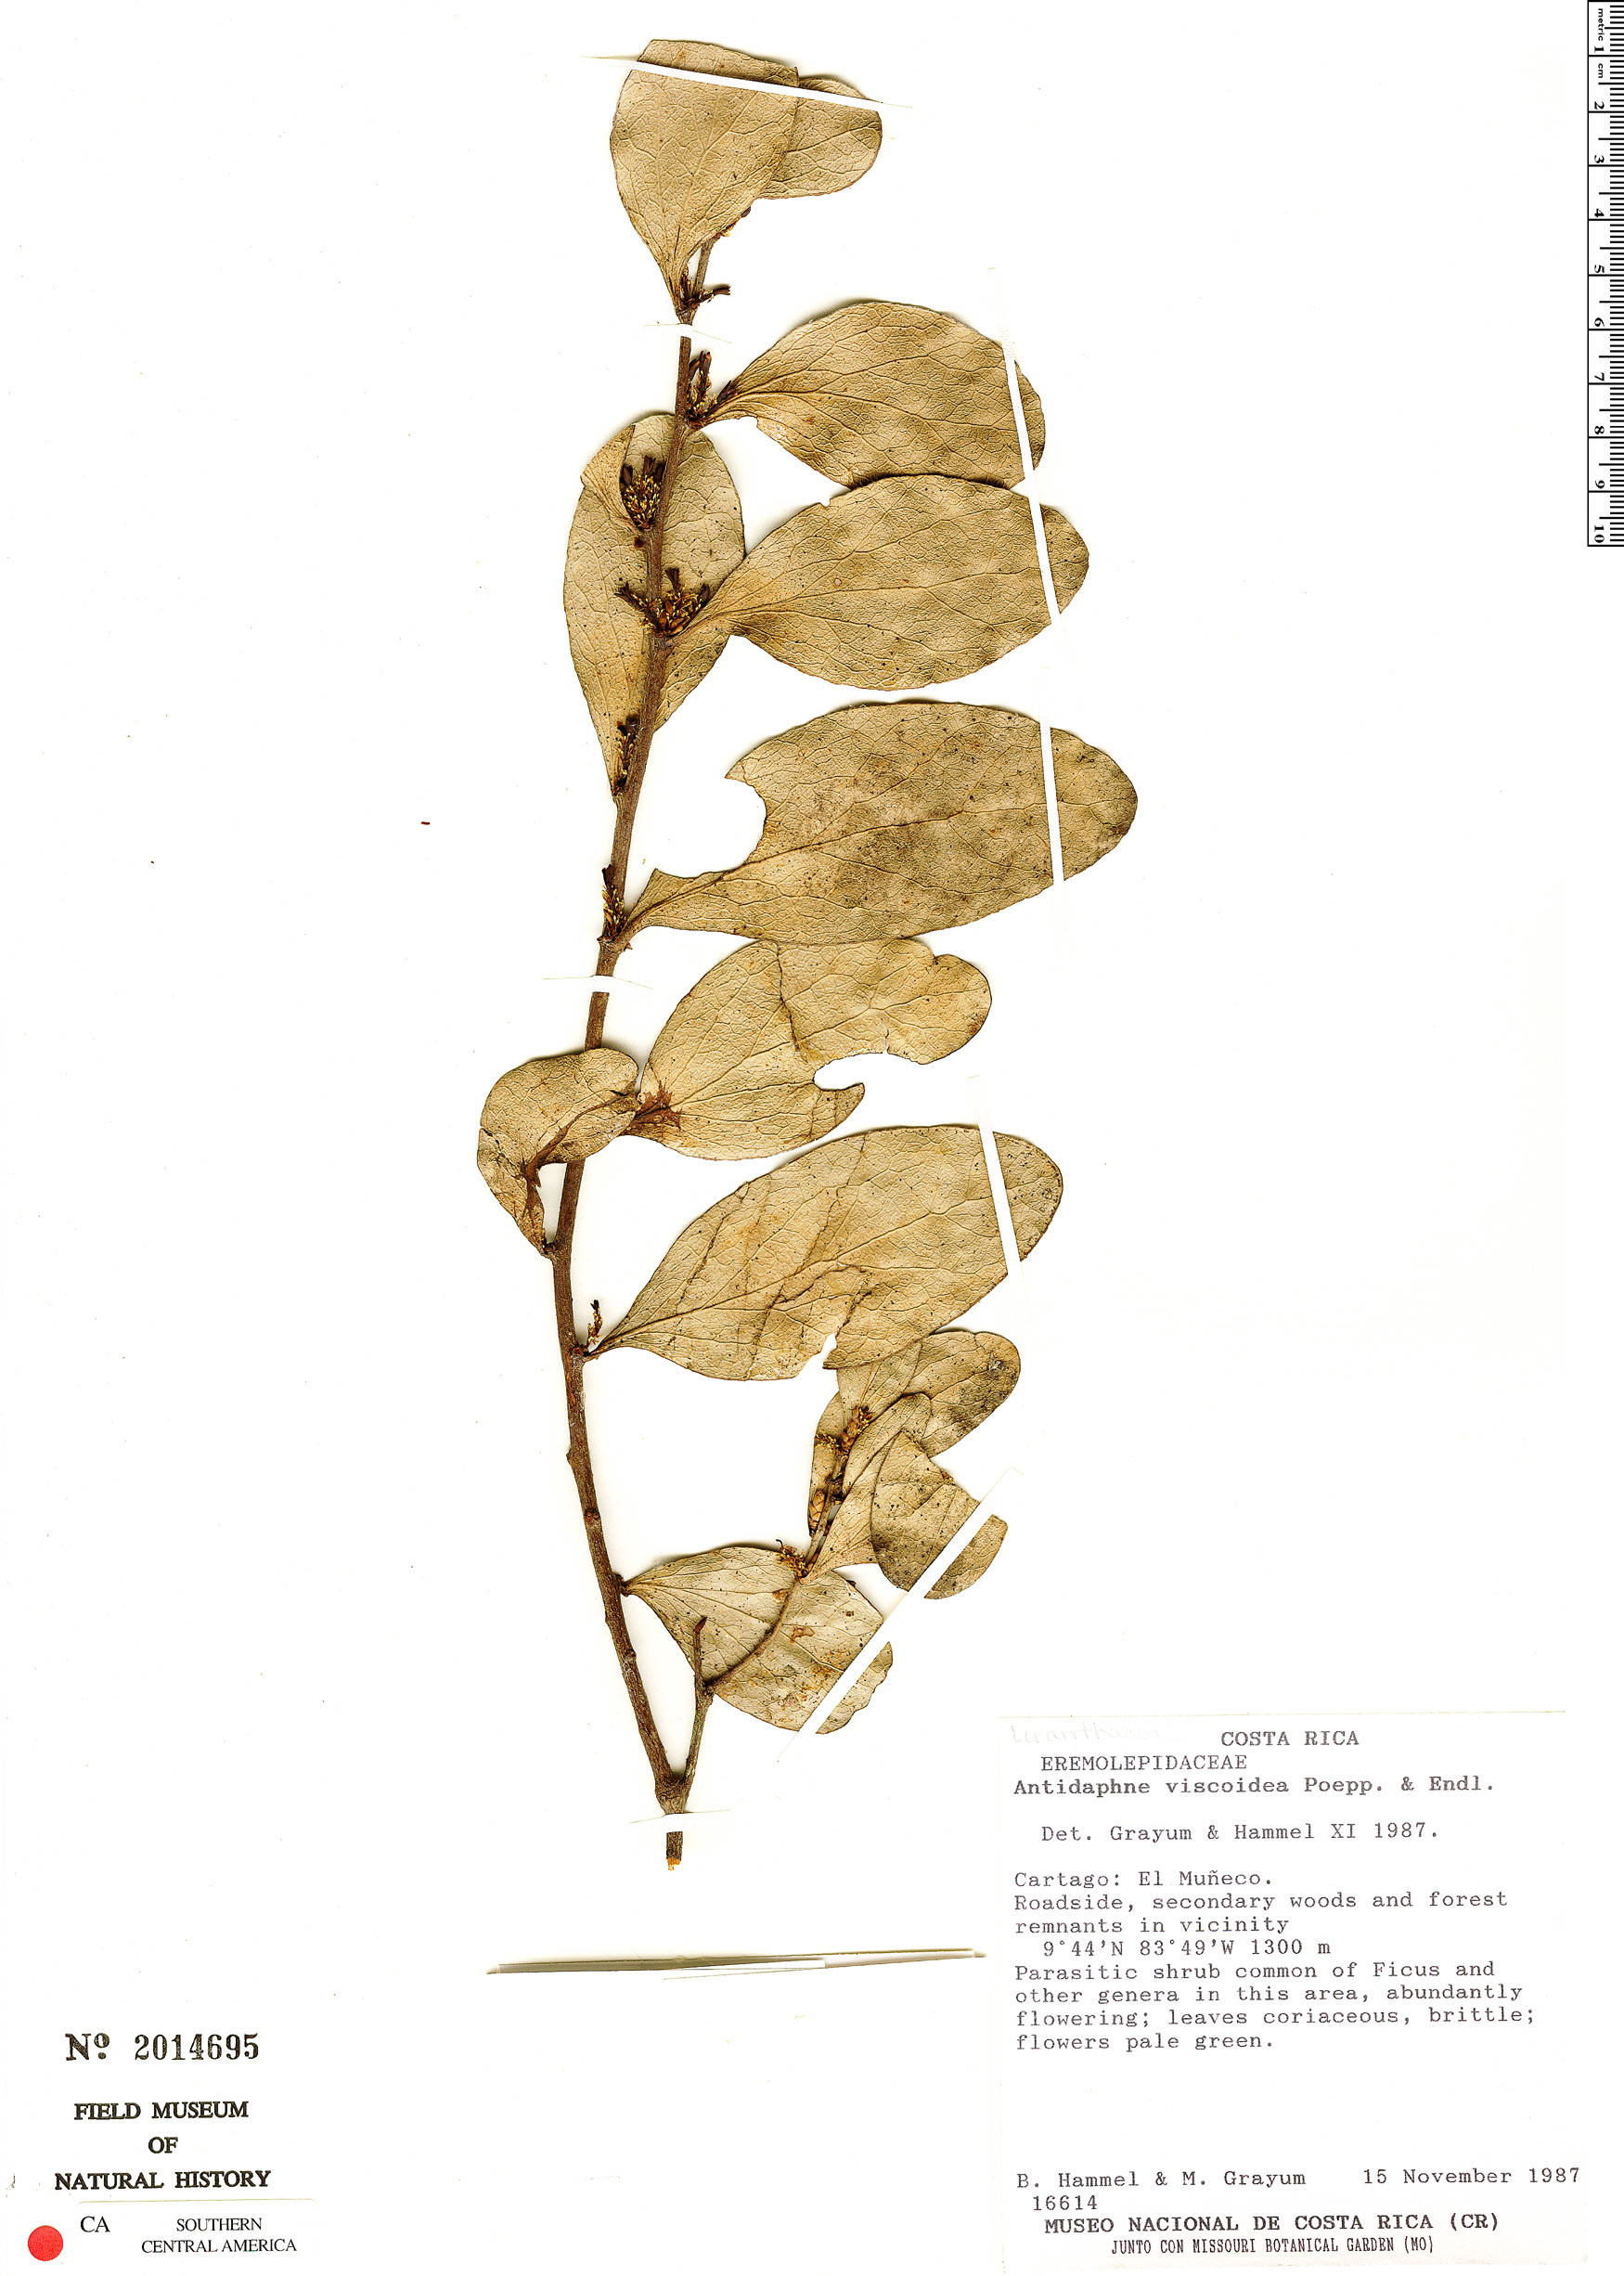 Antidaphne viscoidea image